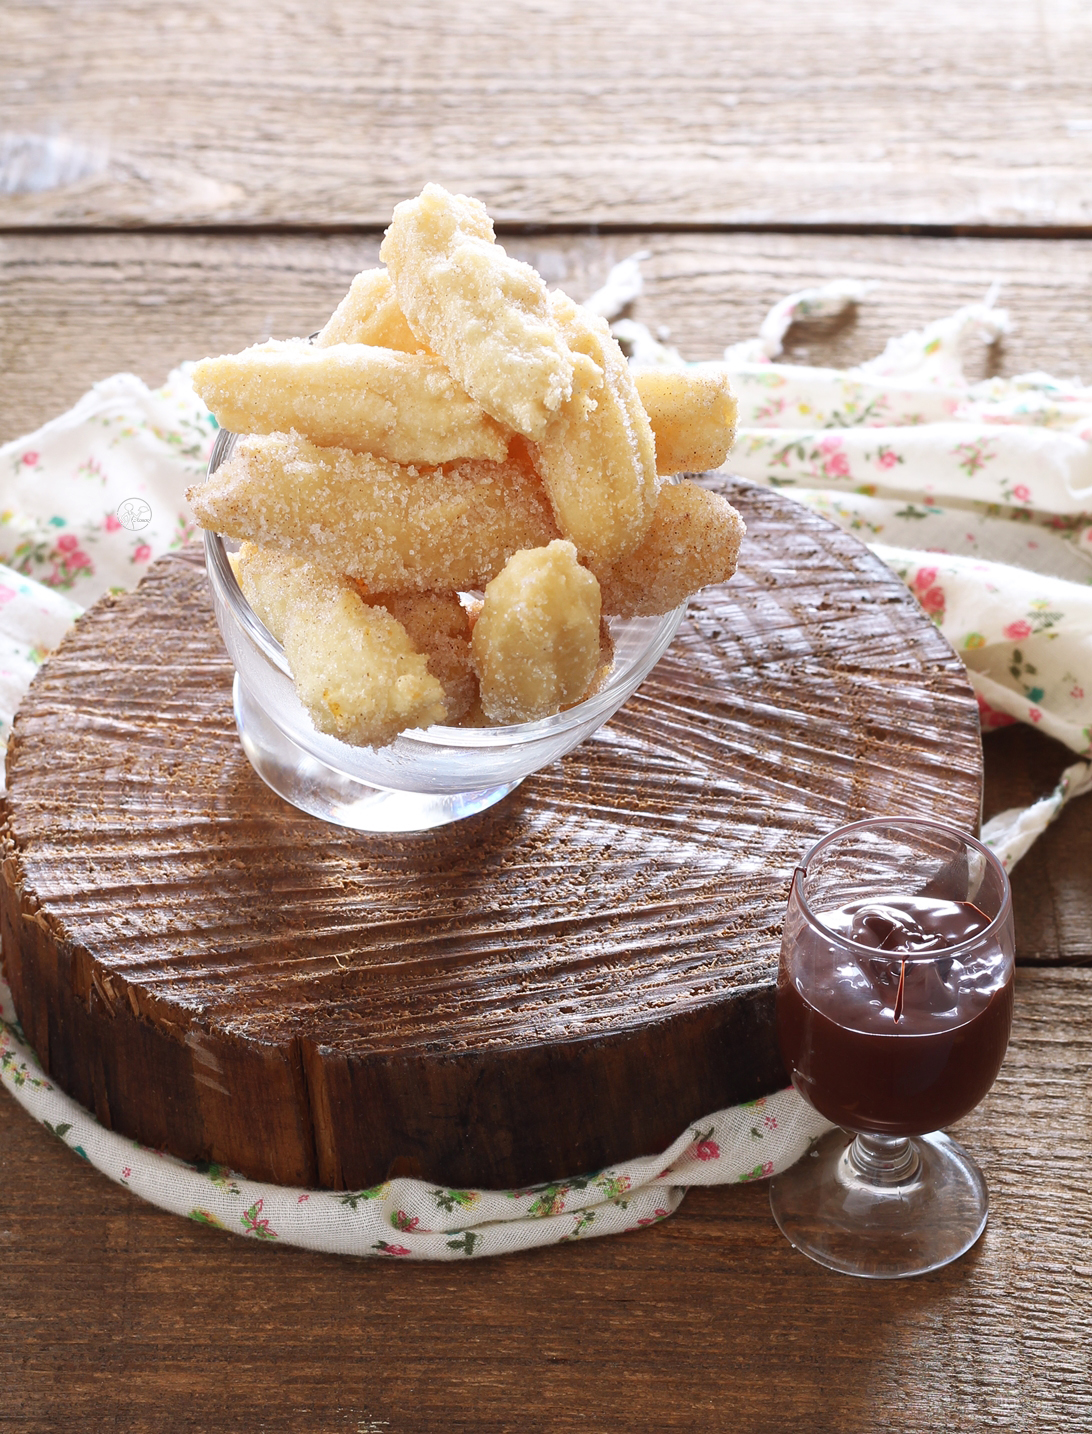 Churros sans gluten et sans œufs - La Cassata Celiaca